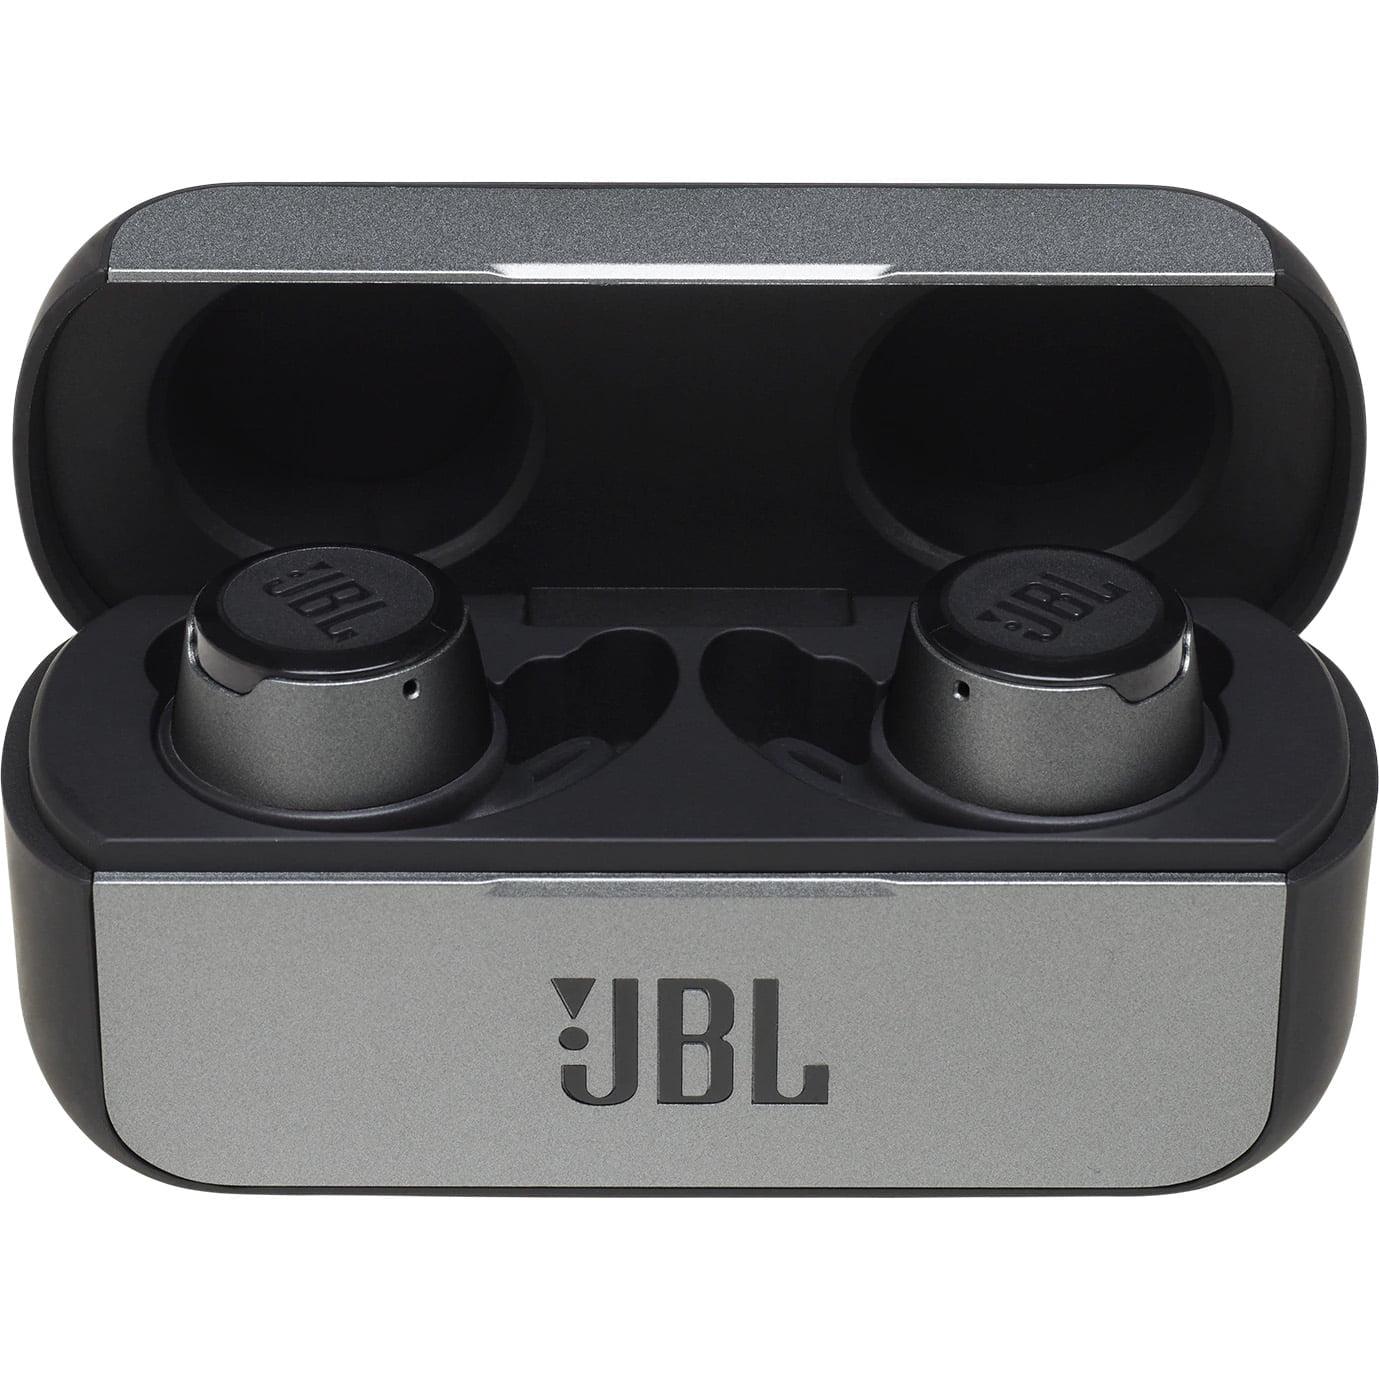 Casti In-Ear JBL ReflectFlow, JBL Signature Sound, Bluetooth Wireless, Carcasa de incarcare, IPX7, Black